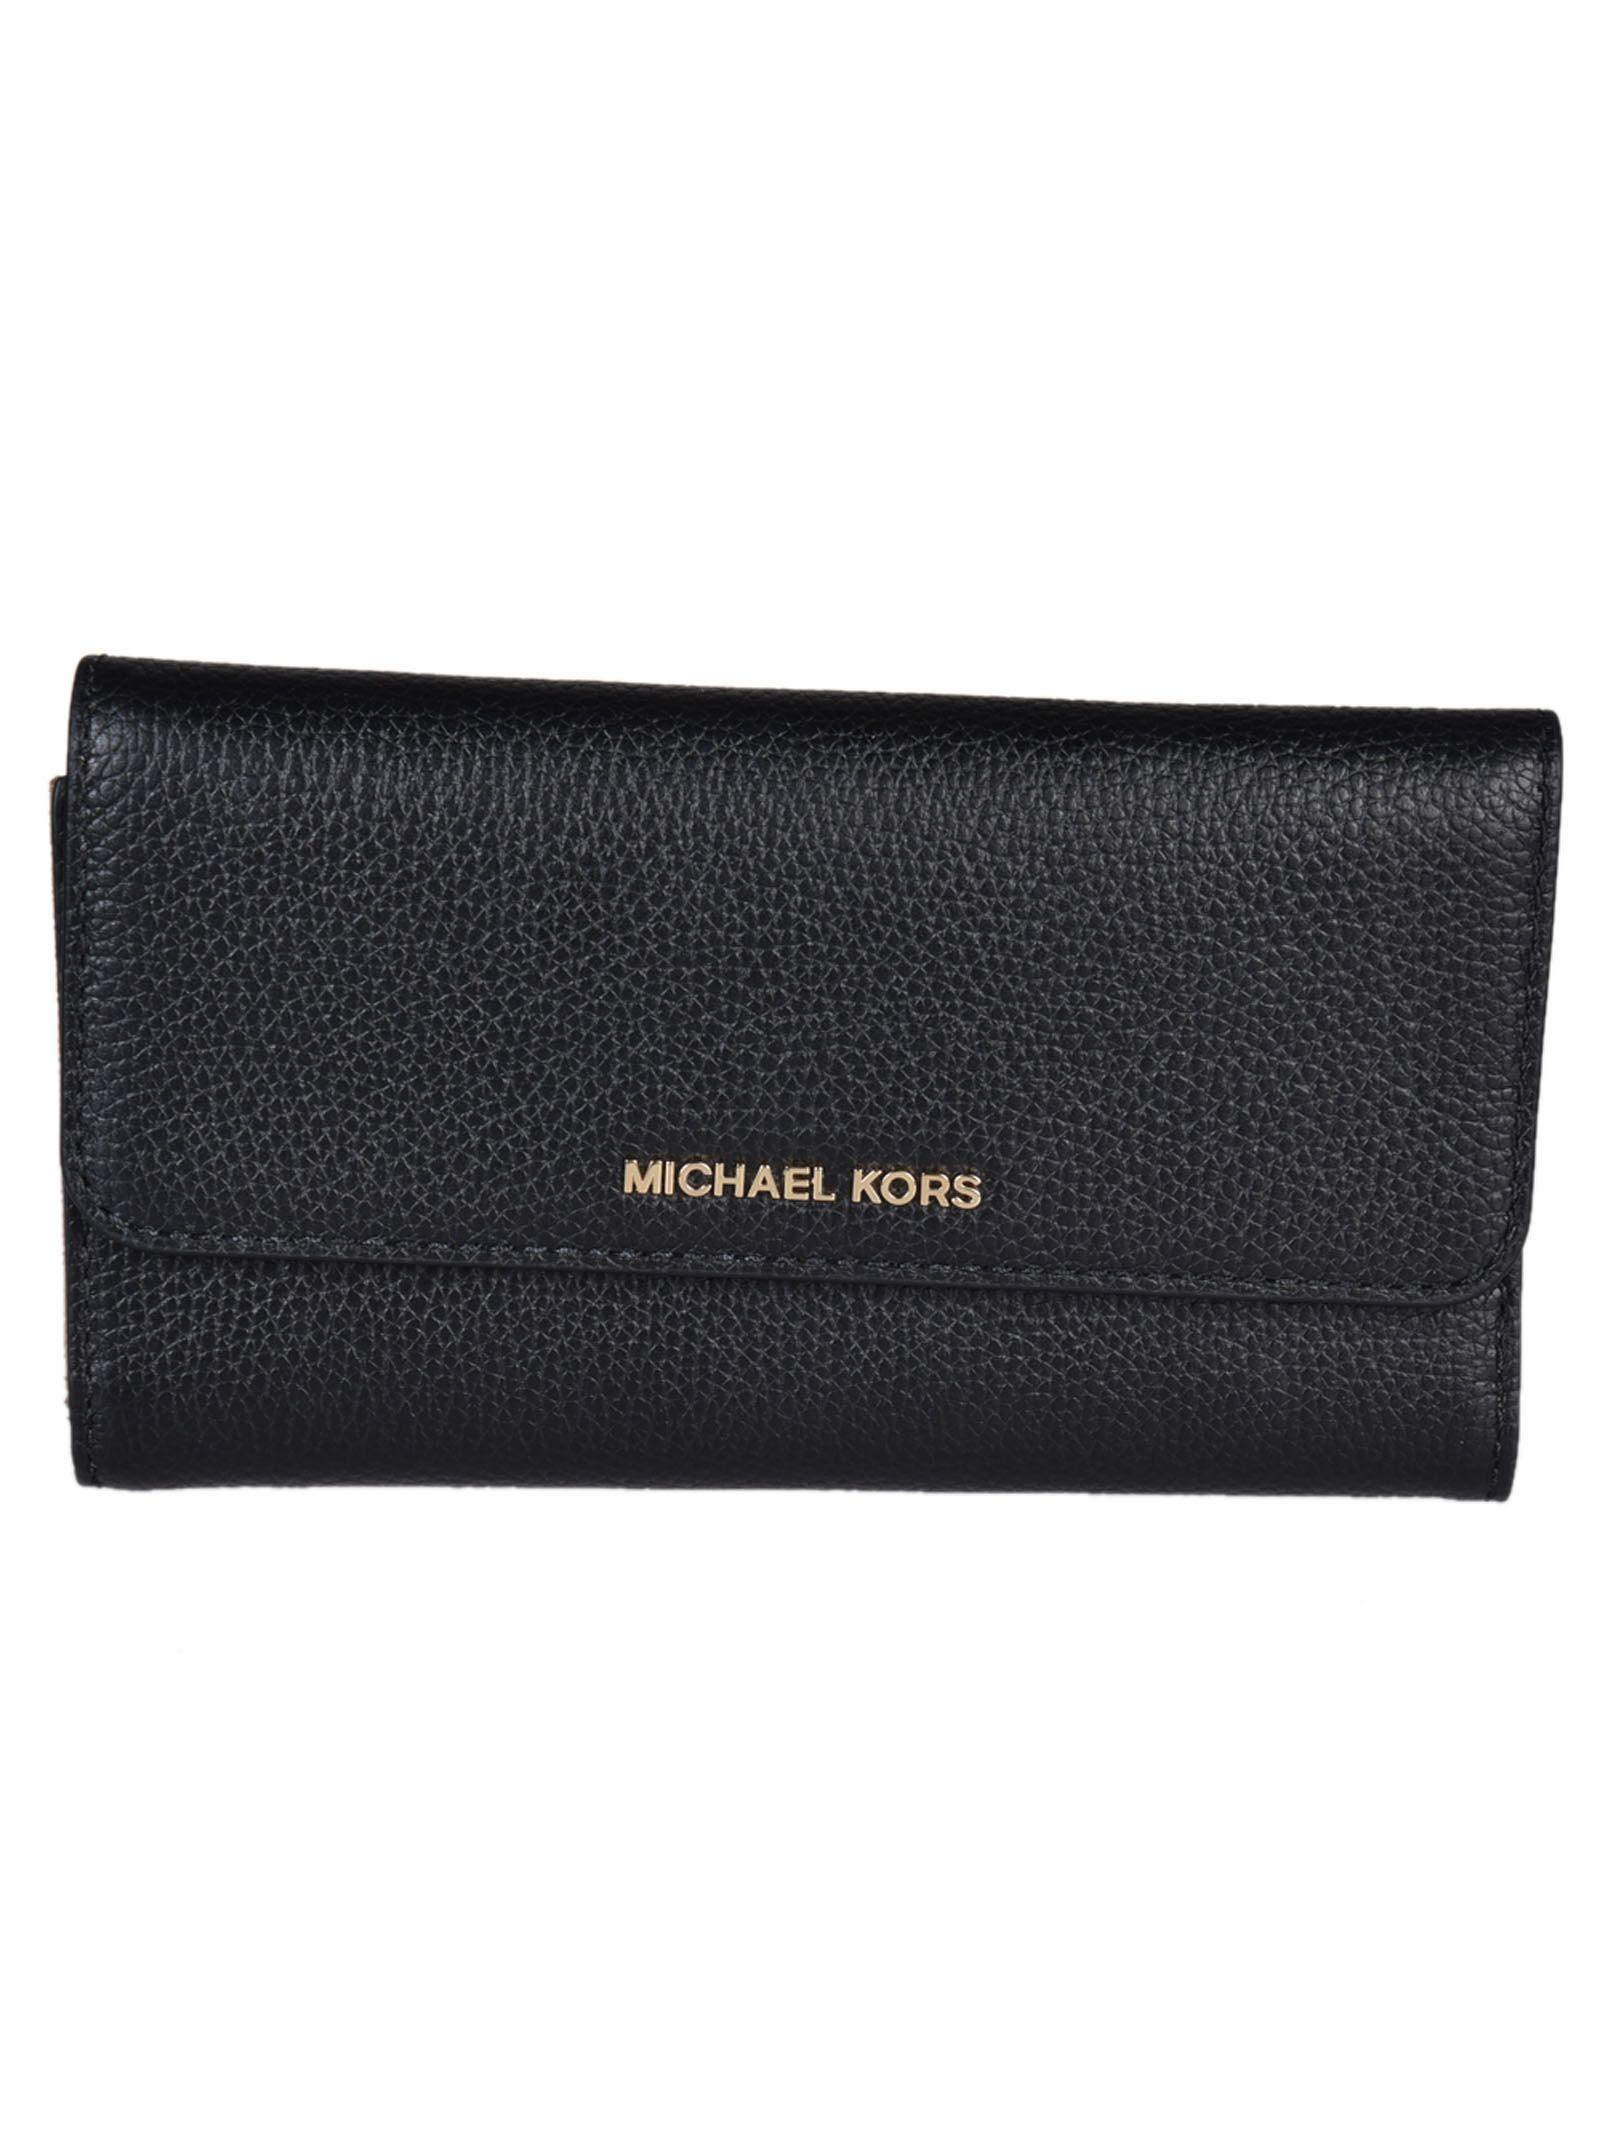 Michael Kors Mercer Tri-fold Wallet